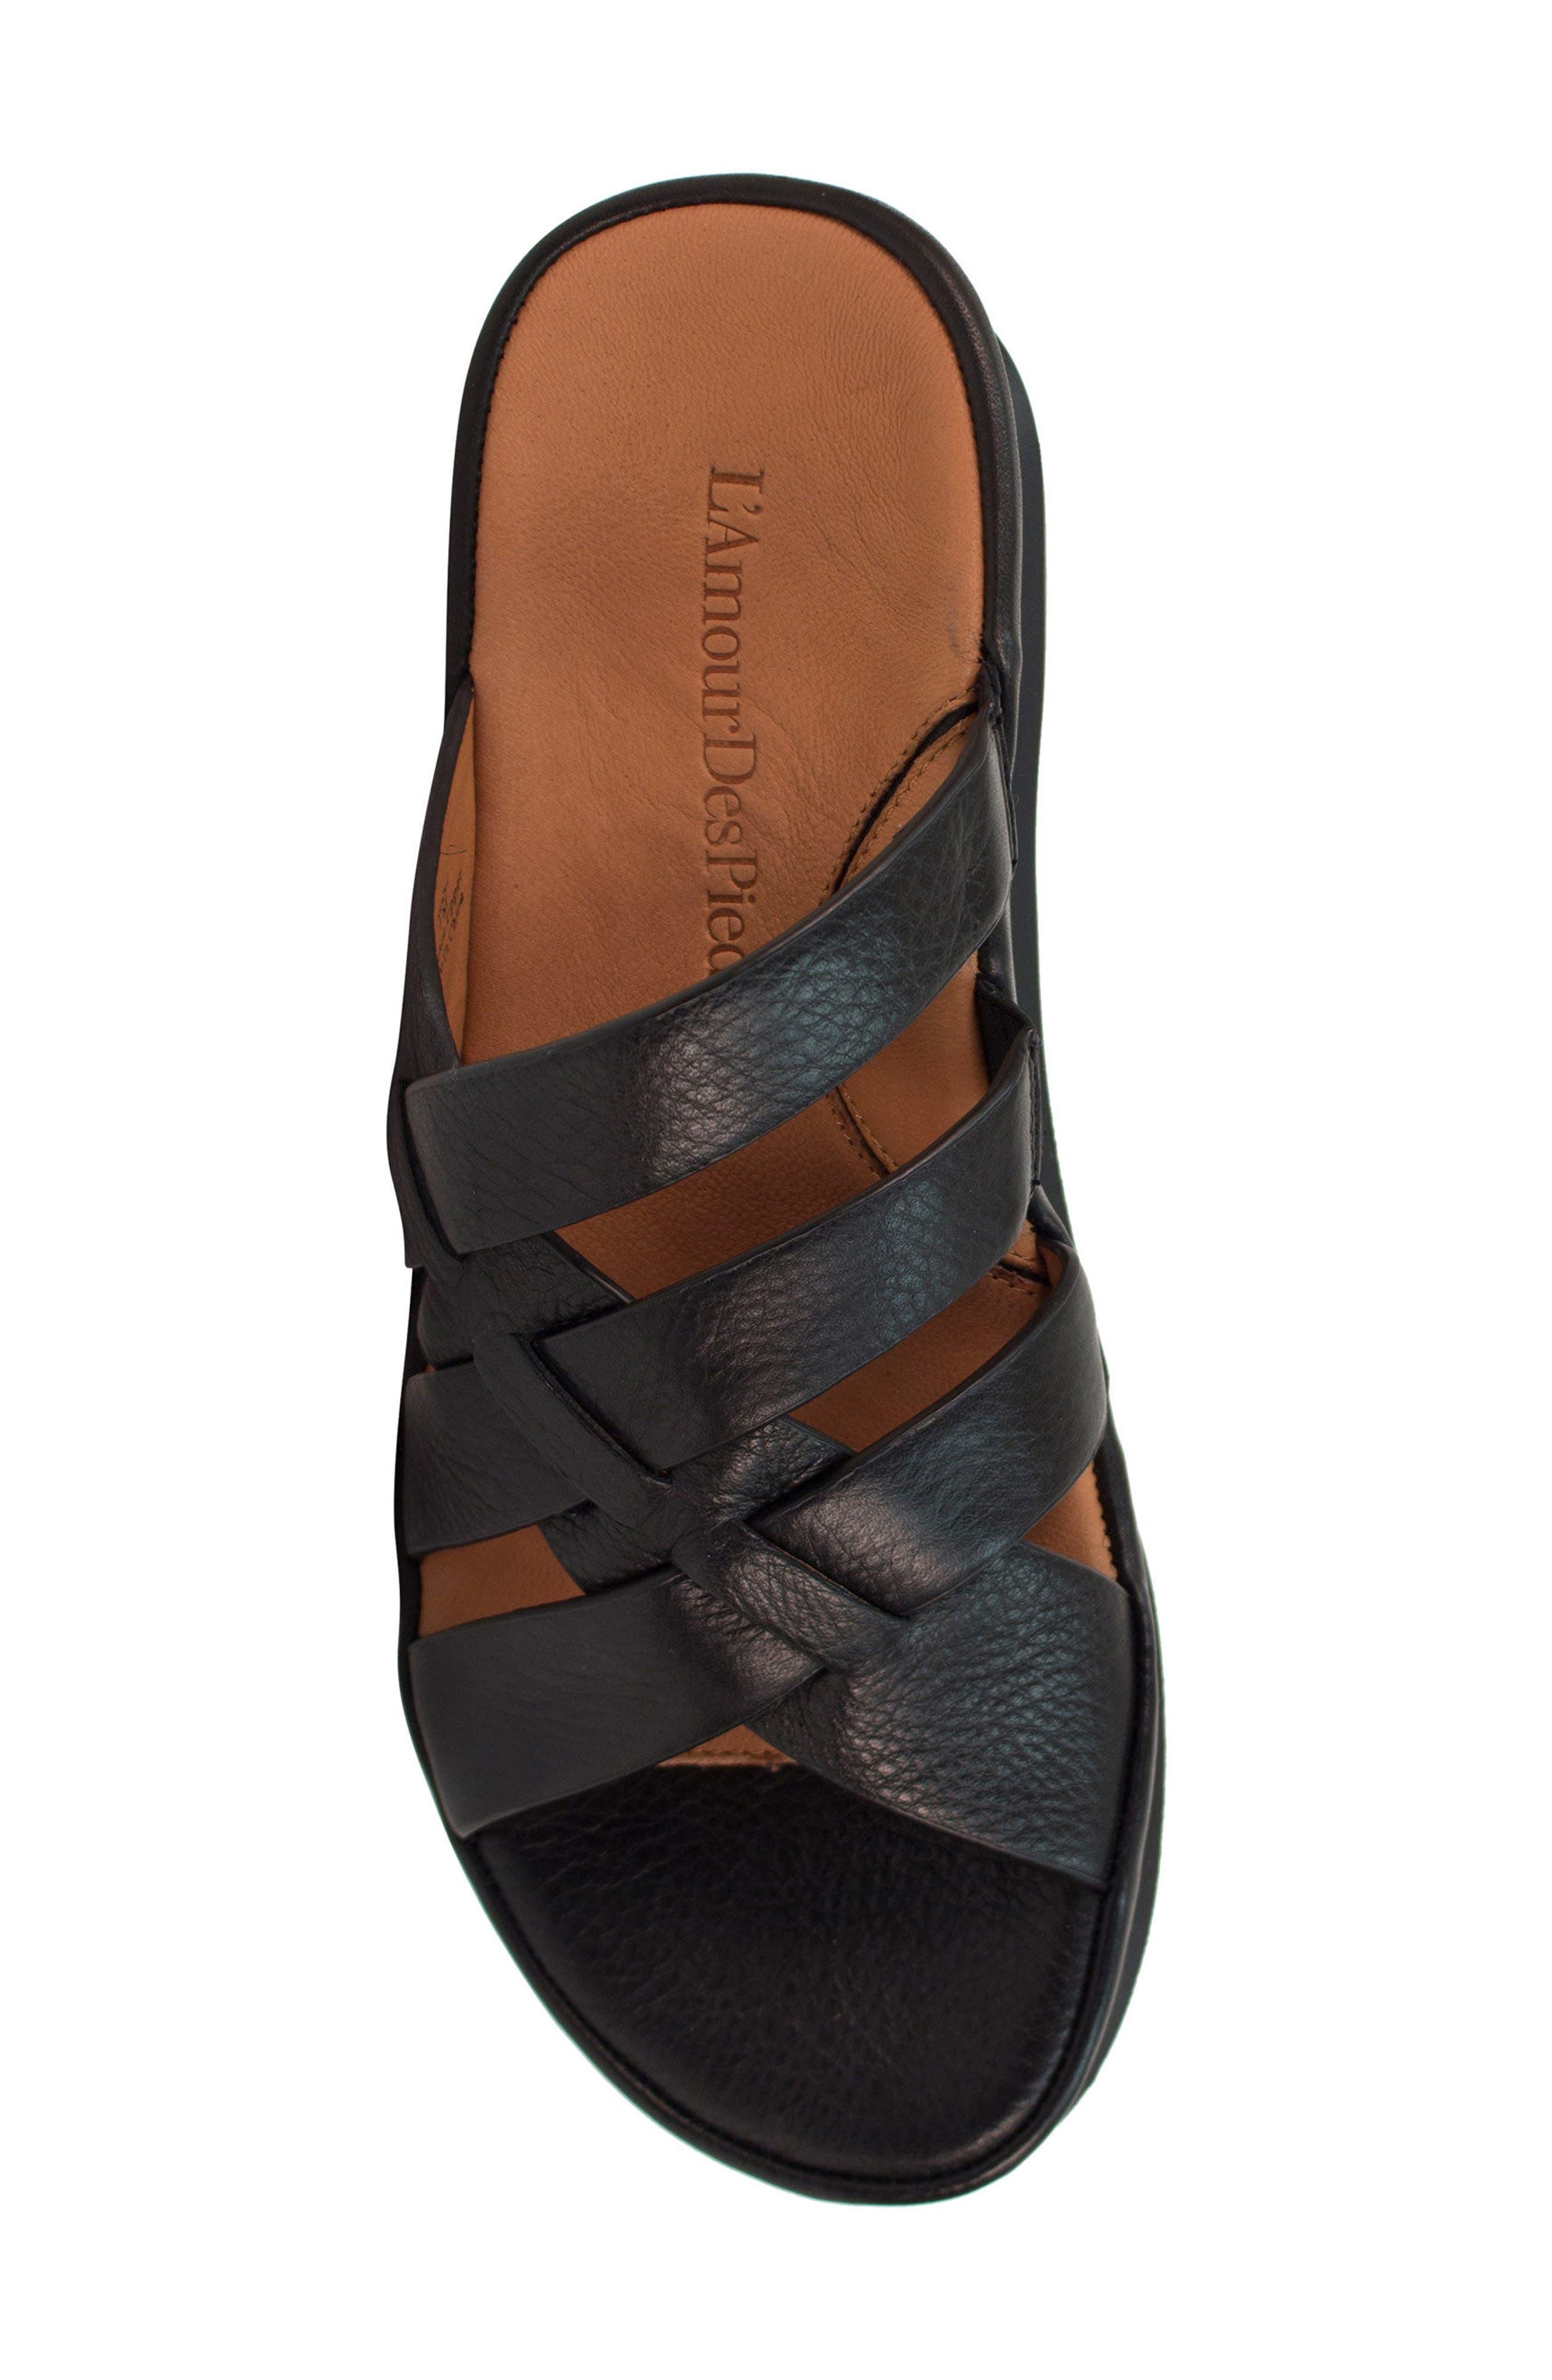 Veryl Sandal,                             Alternate thumbnail 5, color,                             Black Leather